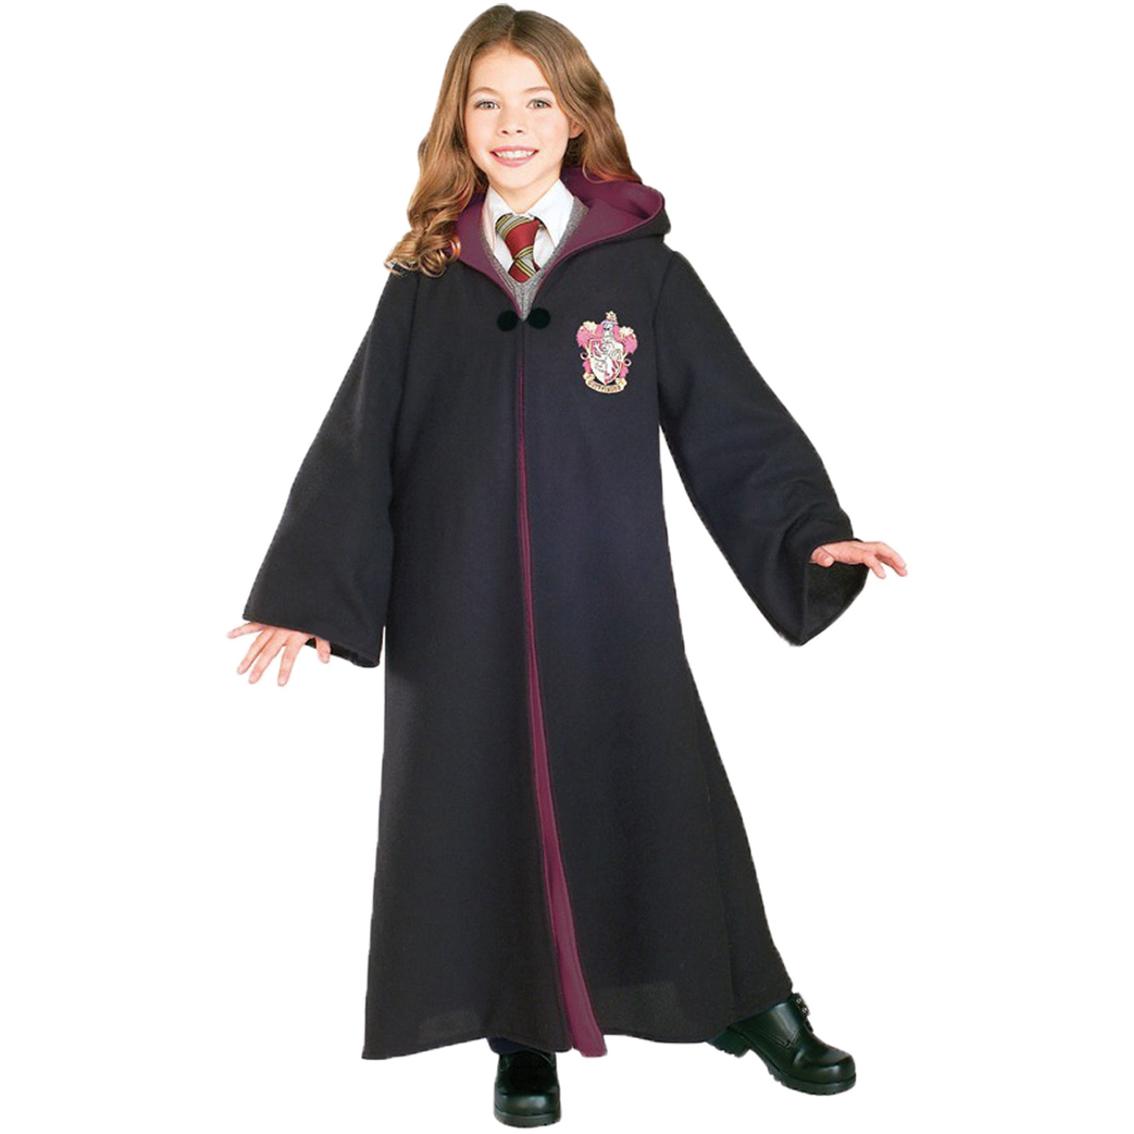 Rubie/'s Harry Potter Gryffindor Socks Costume Accessory